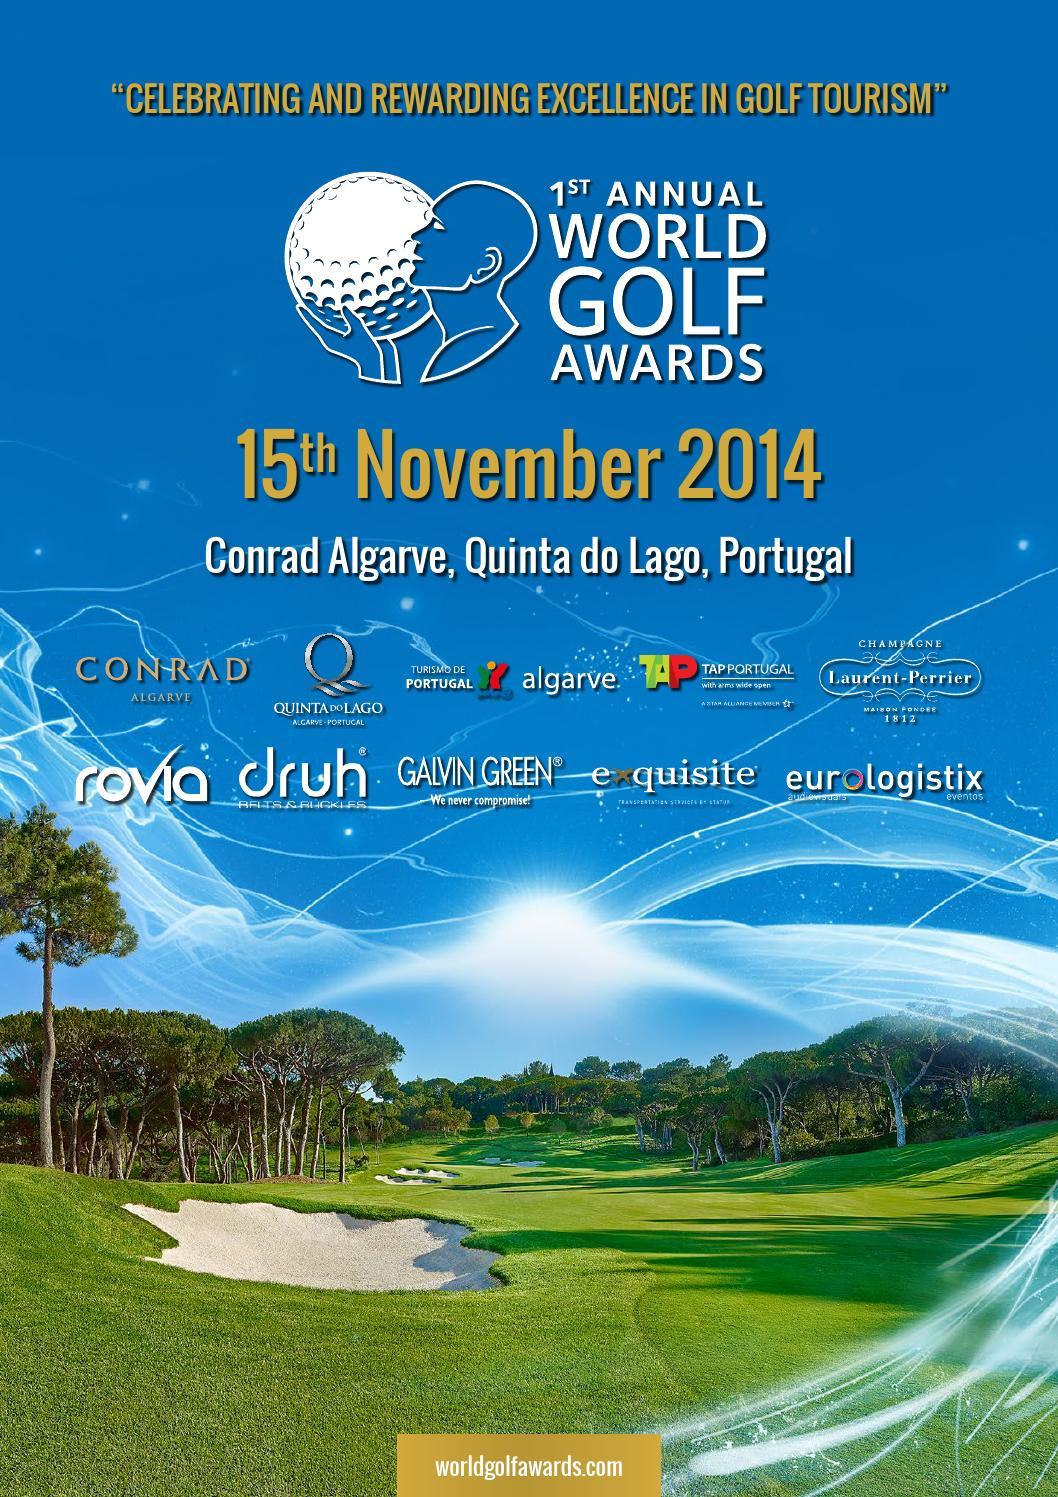 Sueno hotel atlantic golf holidays atlantic golf holidays - Sueno Hotel Atlantic Golf Holidays Atlantic Golf Holidays 43